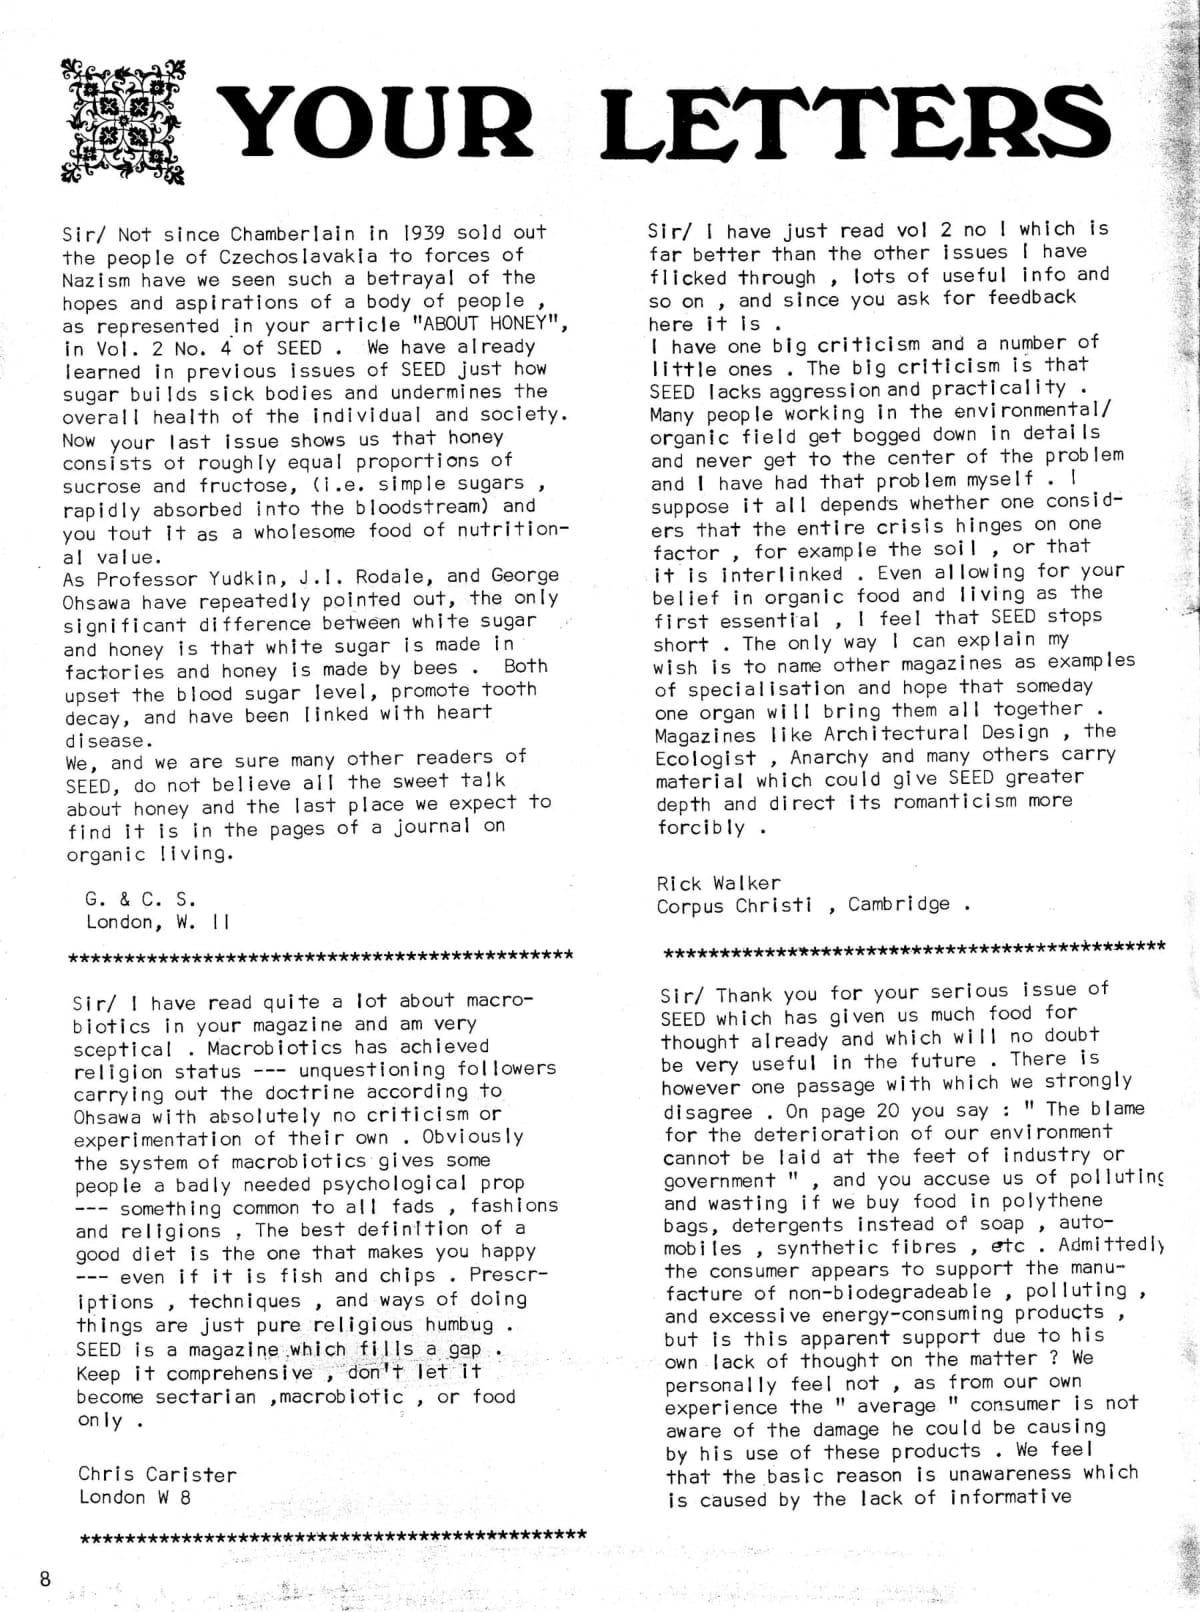 seed-v2-n5-may1973-08.jpg